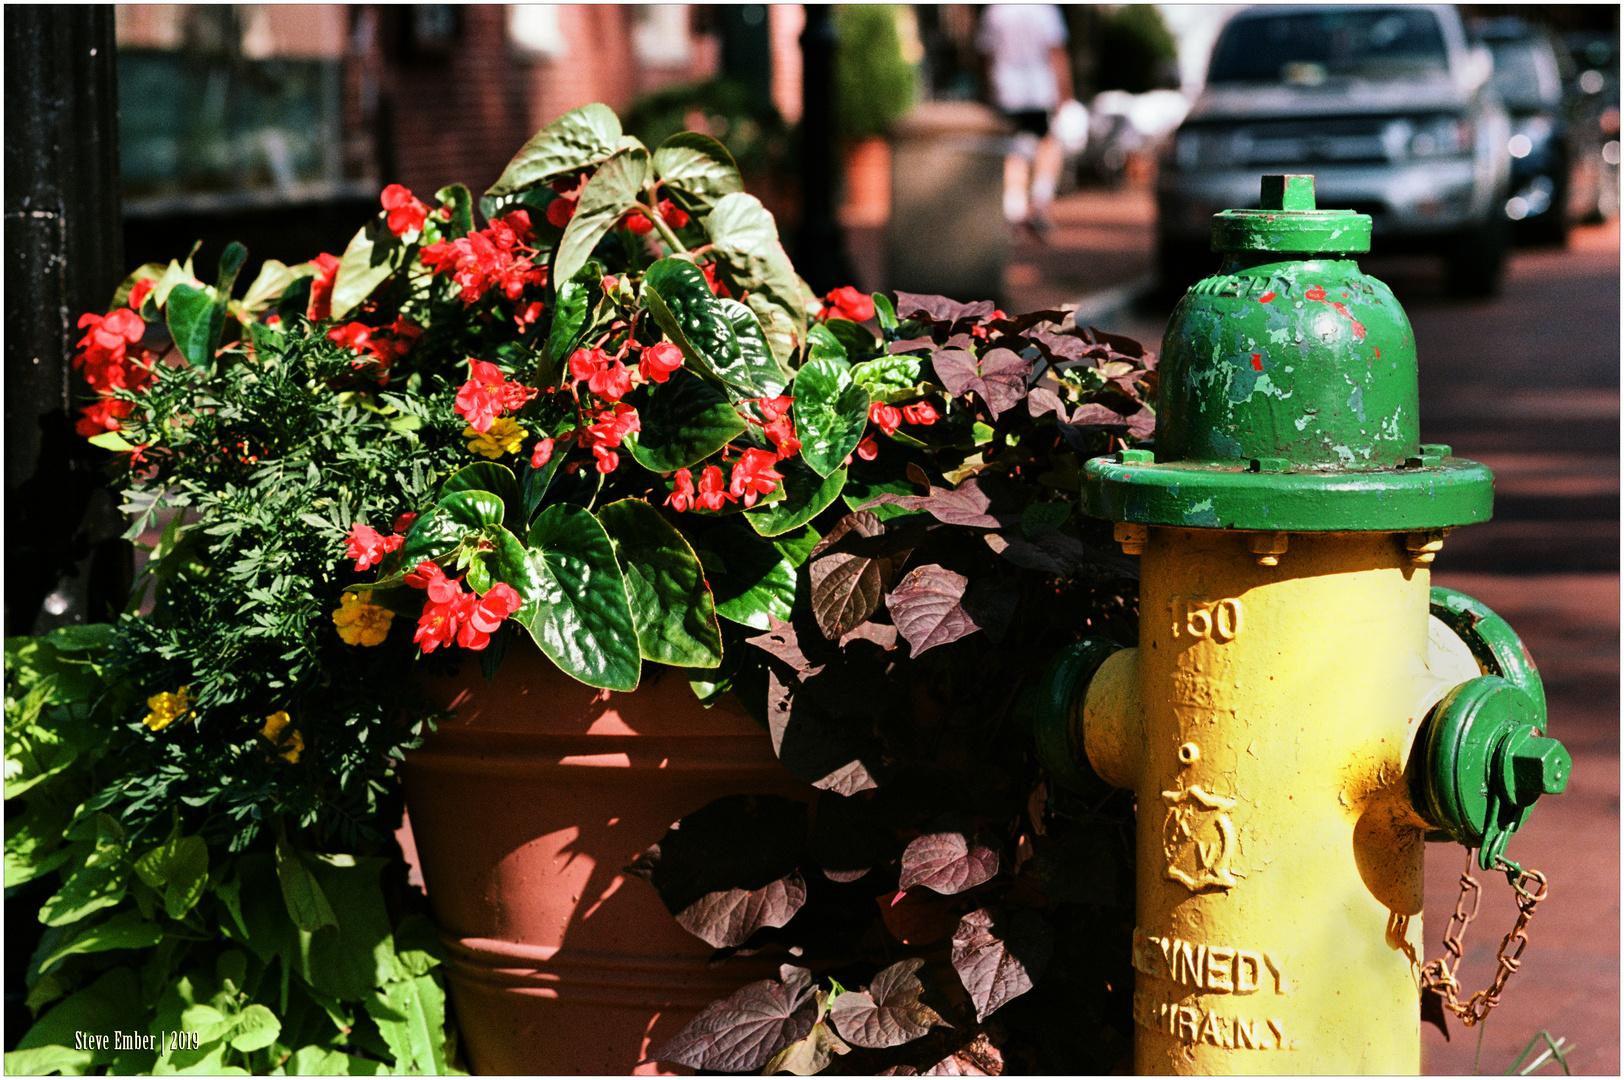 Annapolis No.21 - Flowerpot and Fireplug